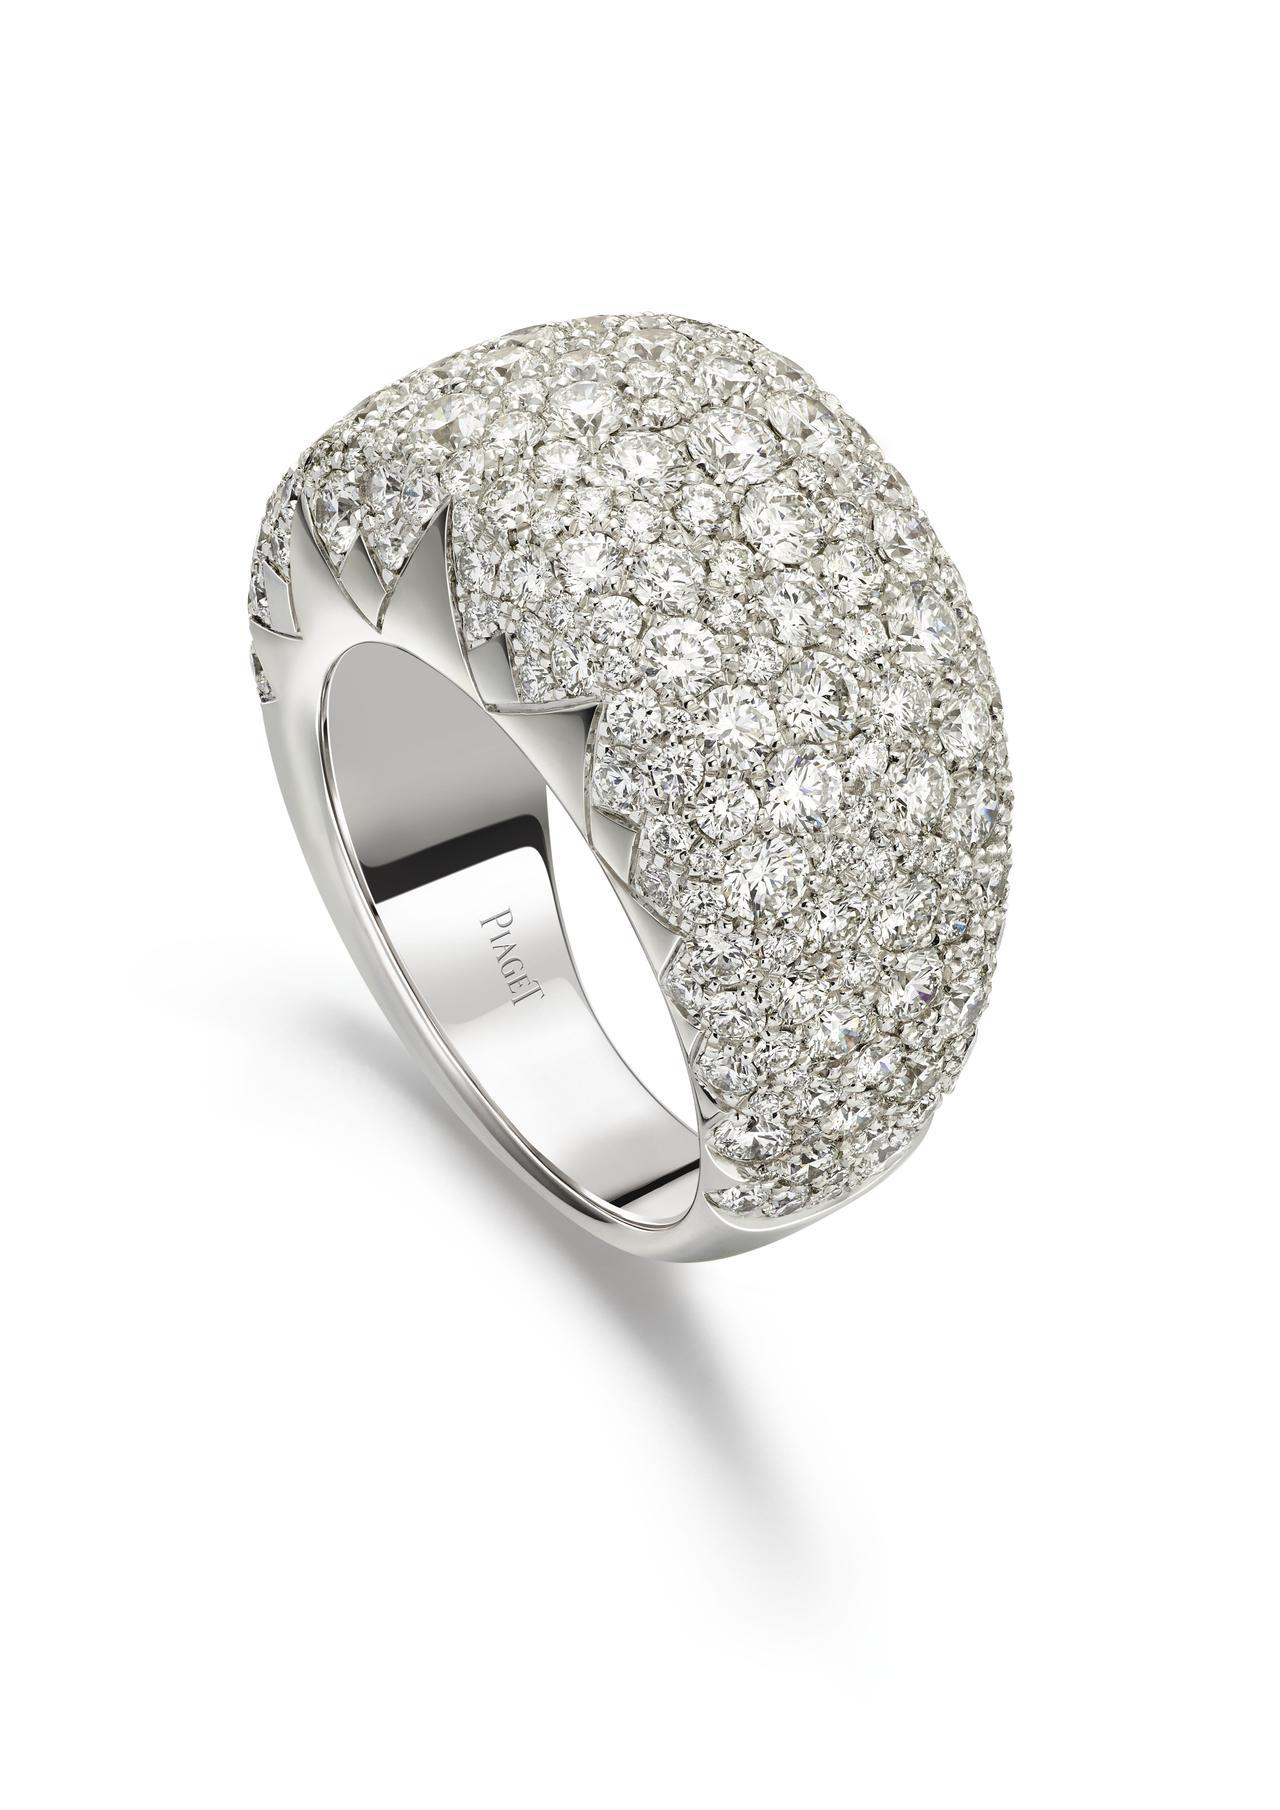 PIAGET Sunlight系列18K白金鑽石戒指,18K白金、250顆圓形明...